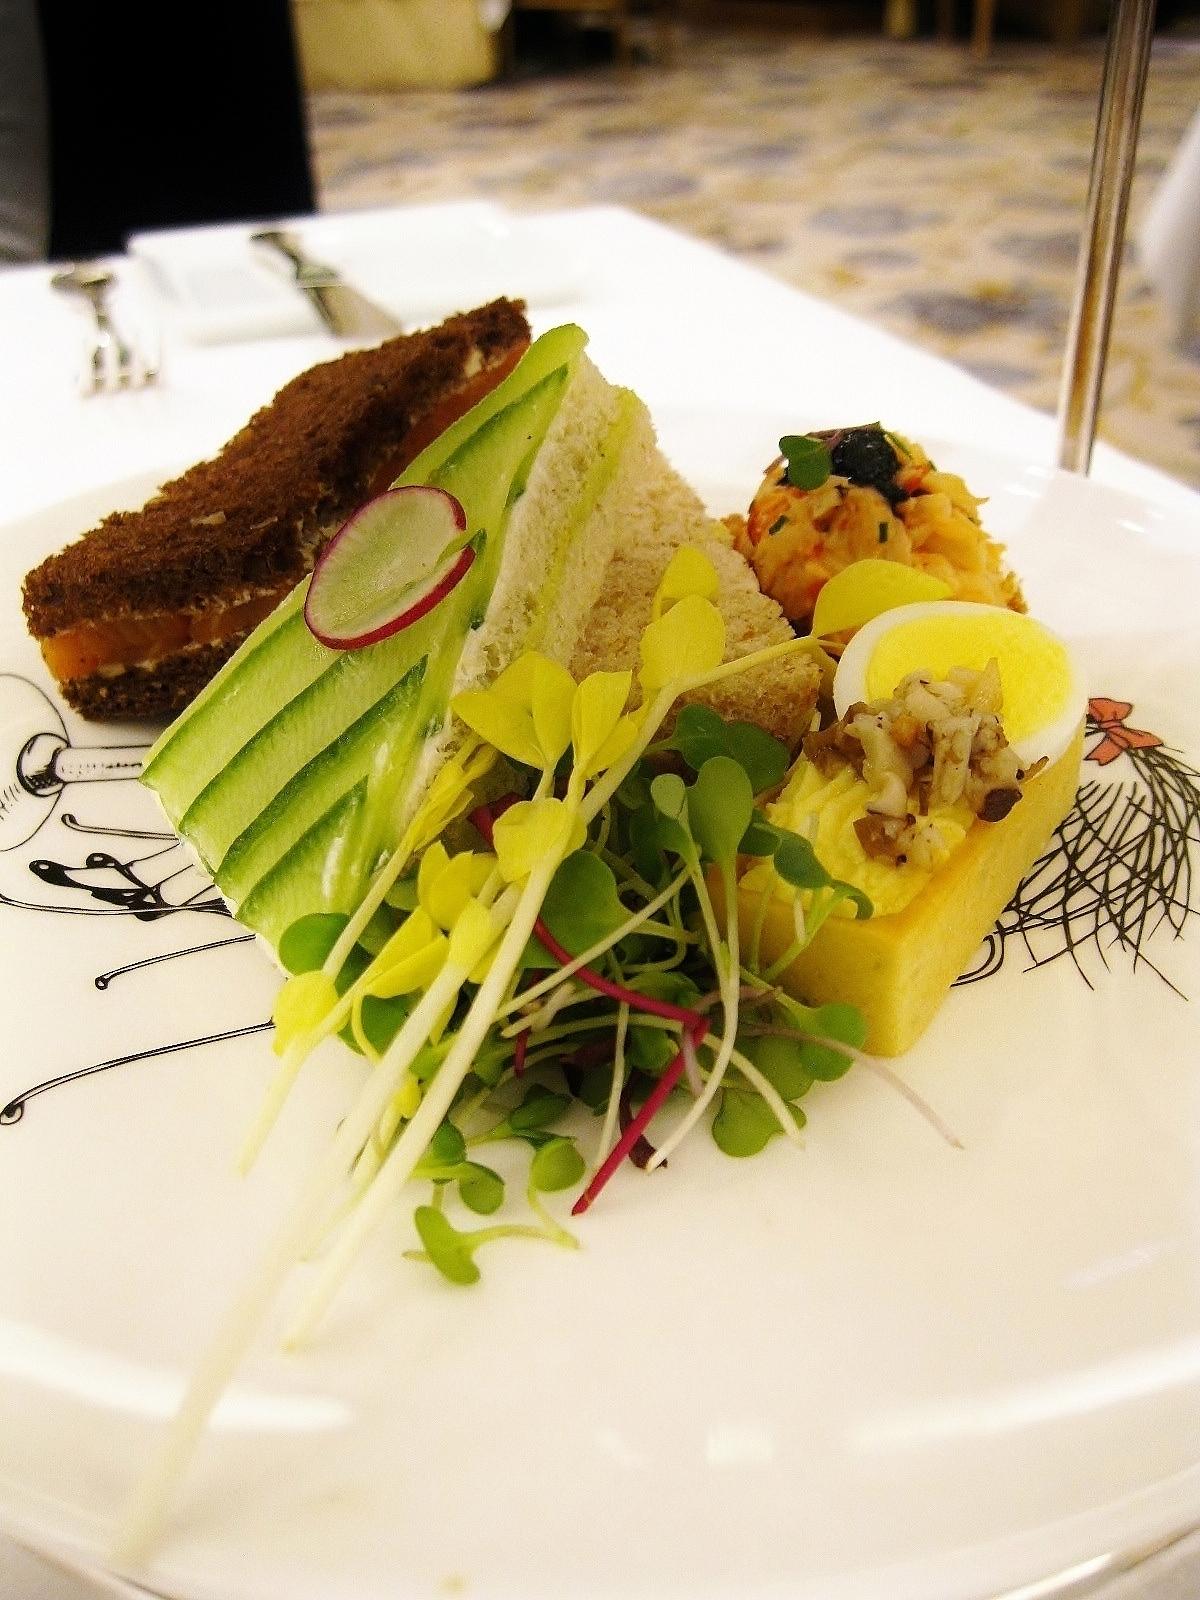 Smoked Salmon And Endive Tea Sandwiches Recipes — Dishmaps